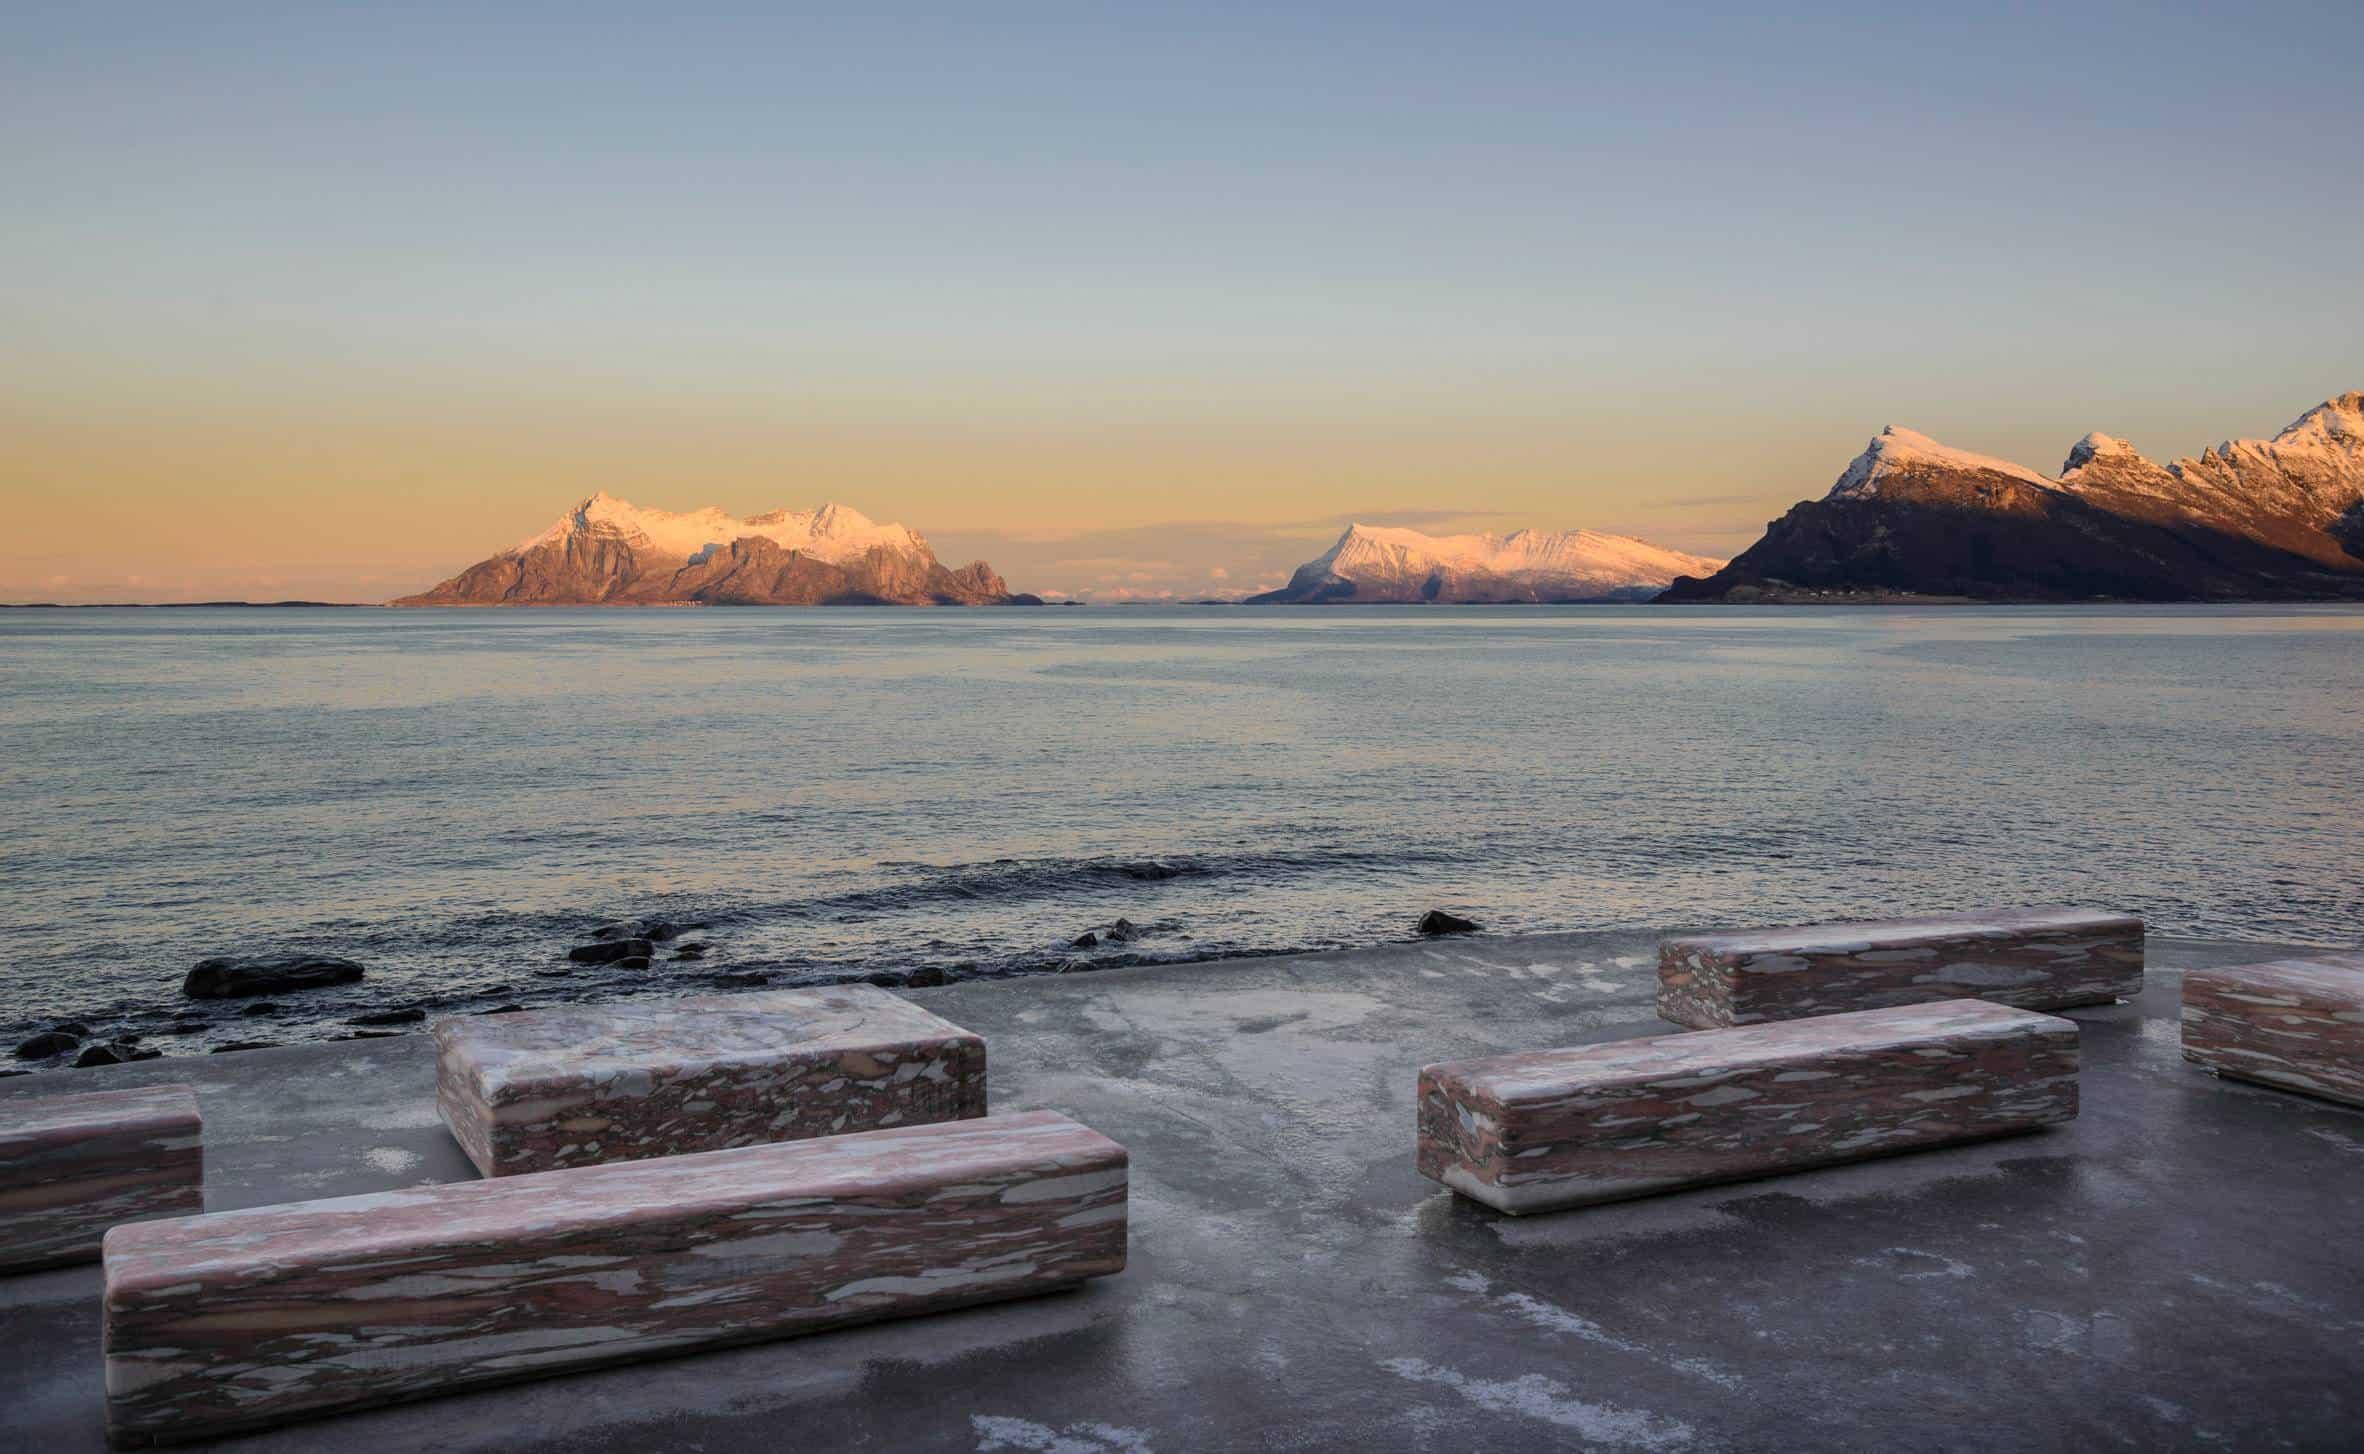 haugen zohar arkitekter hza wave shaped toilet facility norwegian scenic route 7